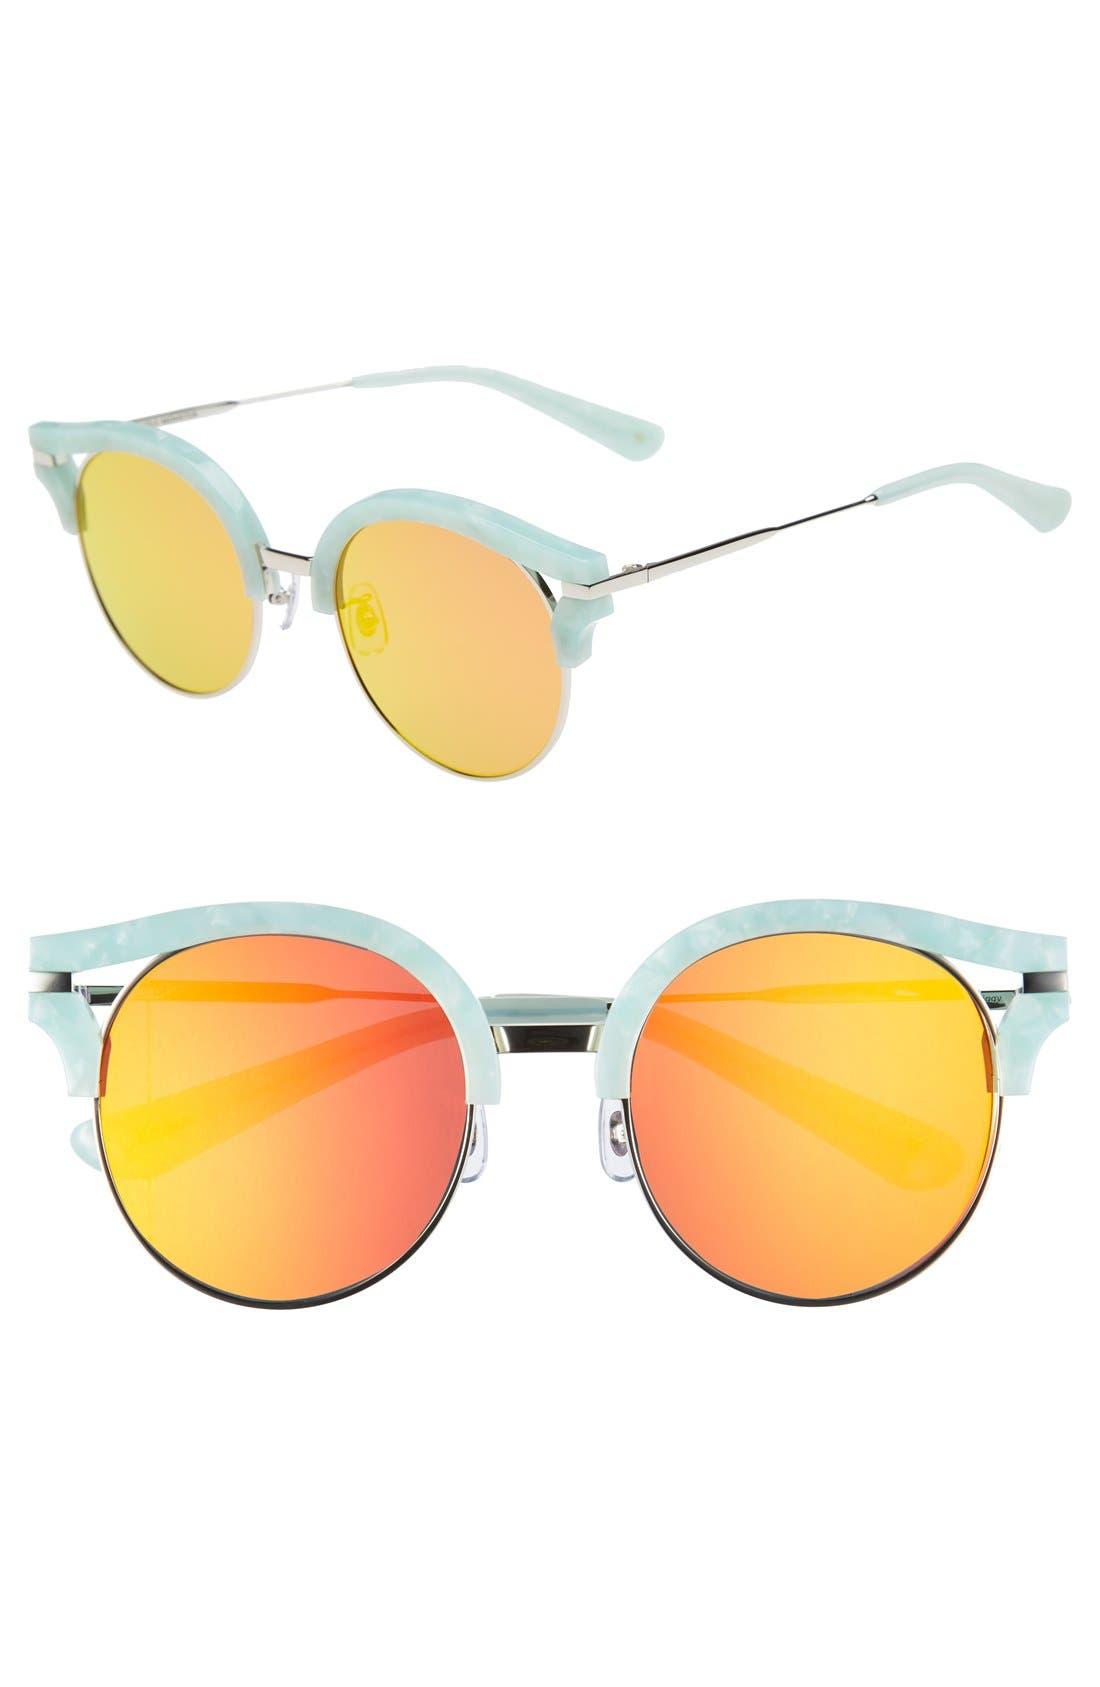 Main Image - Gentle Monster 50mm Retro Sunglasses